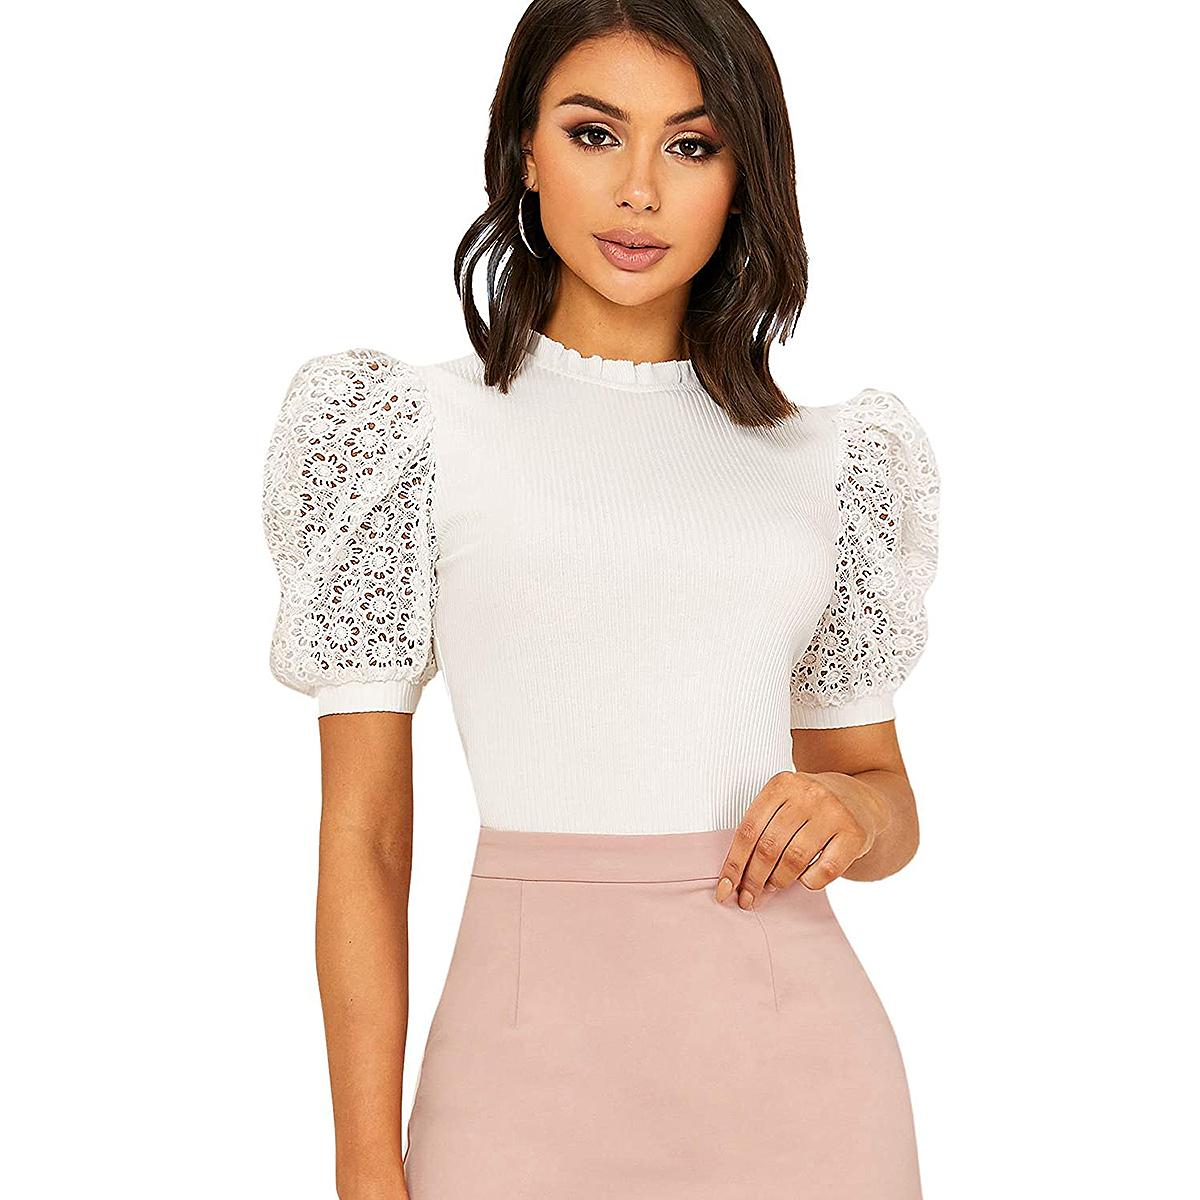 amazon-bridgerton-style-lace-puff-sleeve-top